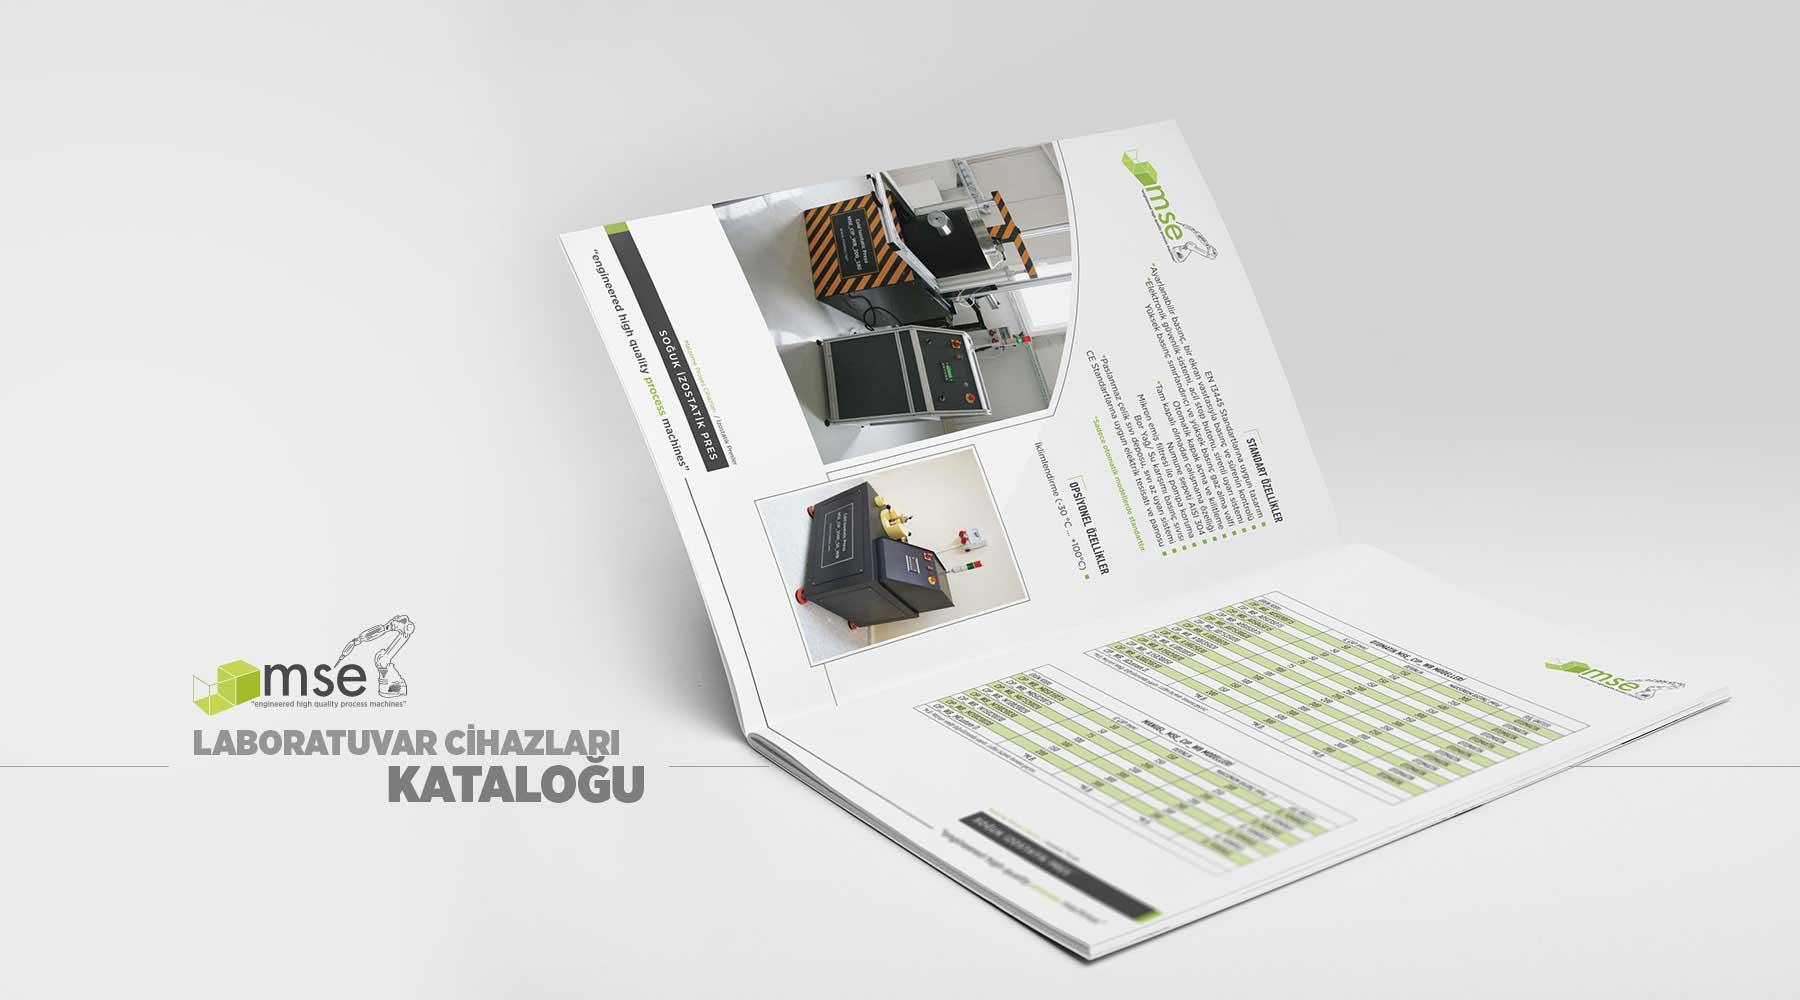 Mse Teknoloji katalog tasarımı